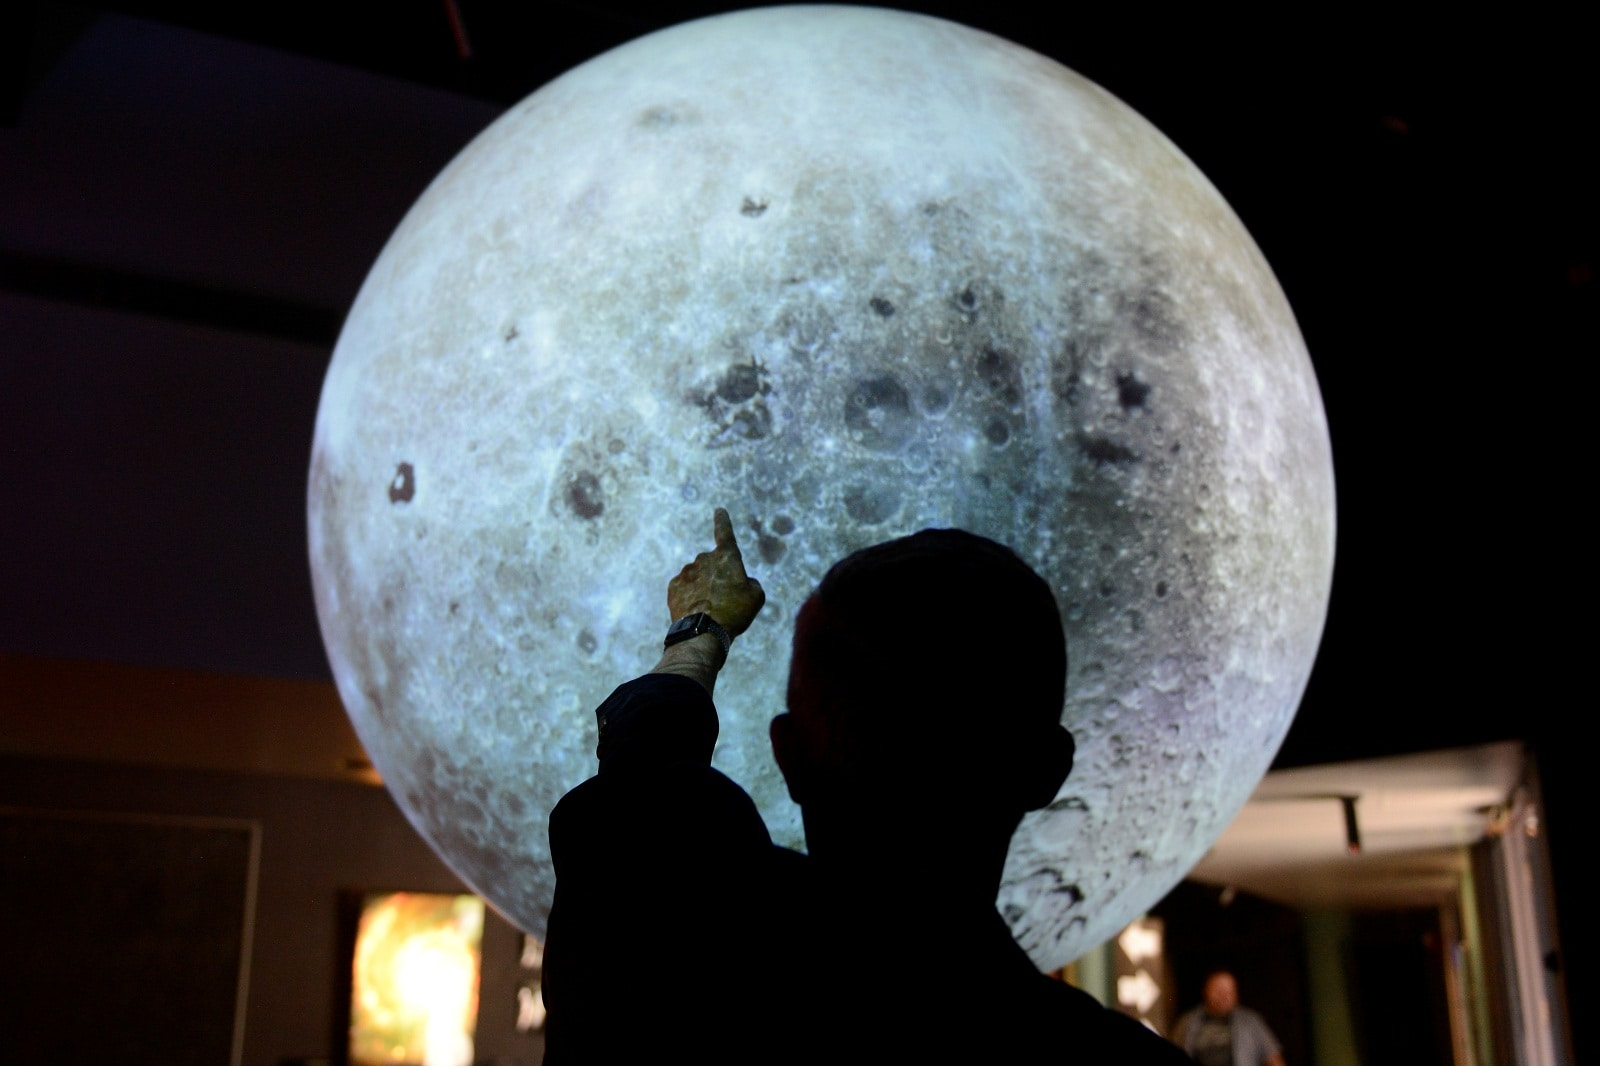 Jack Burns points out locations on a lunar globe at the Fiske Planetarium in Boulder, Colorado, US, June 24, 2019. REUTERS/Michael Ciaglo